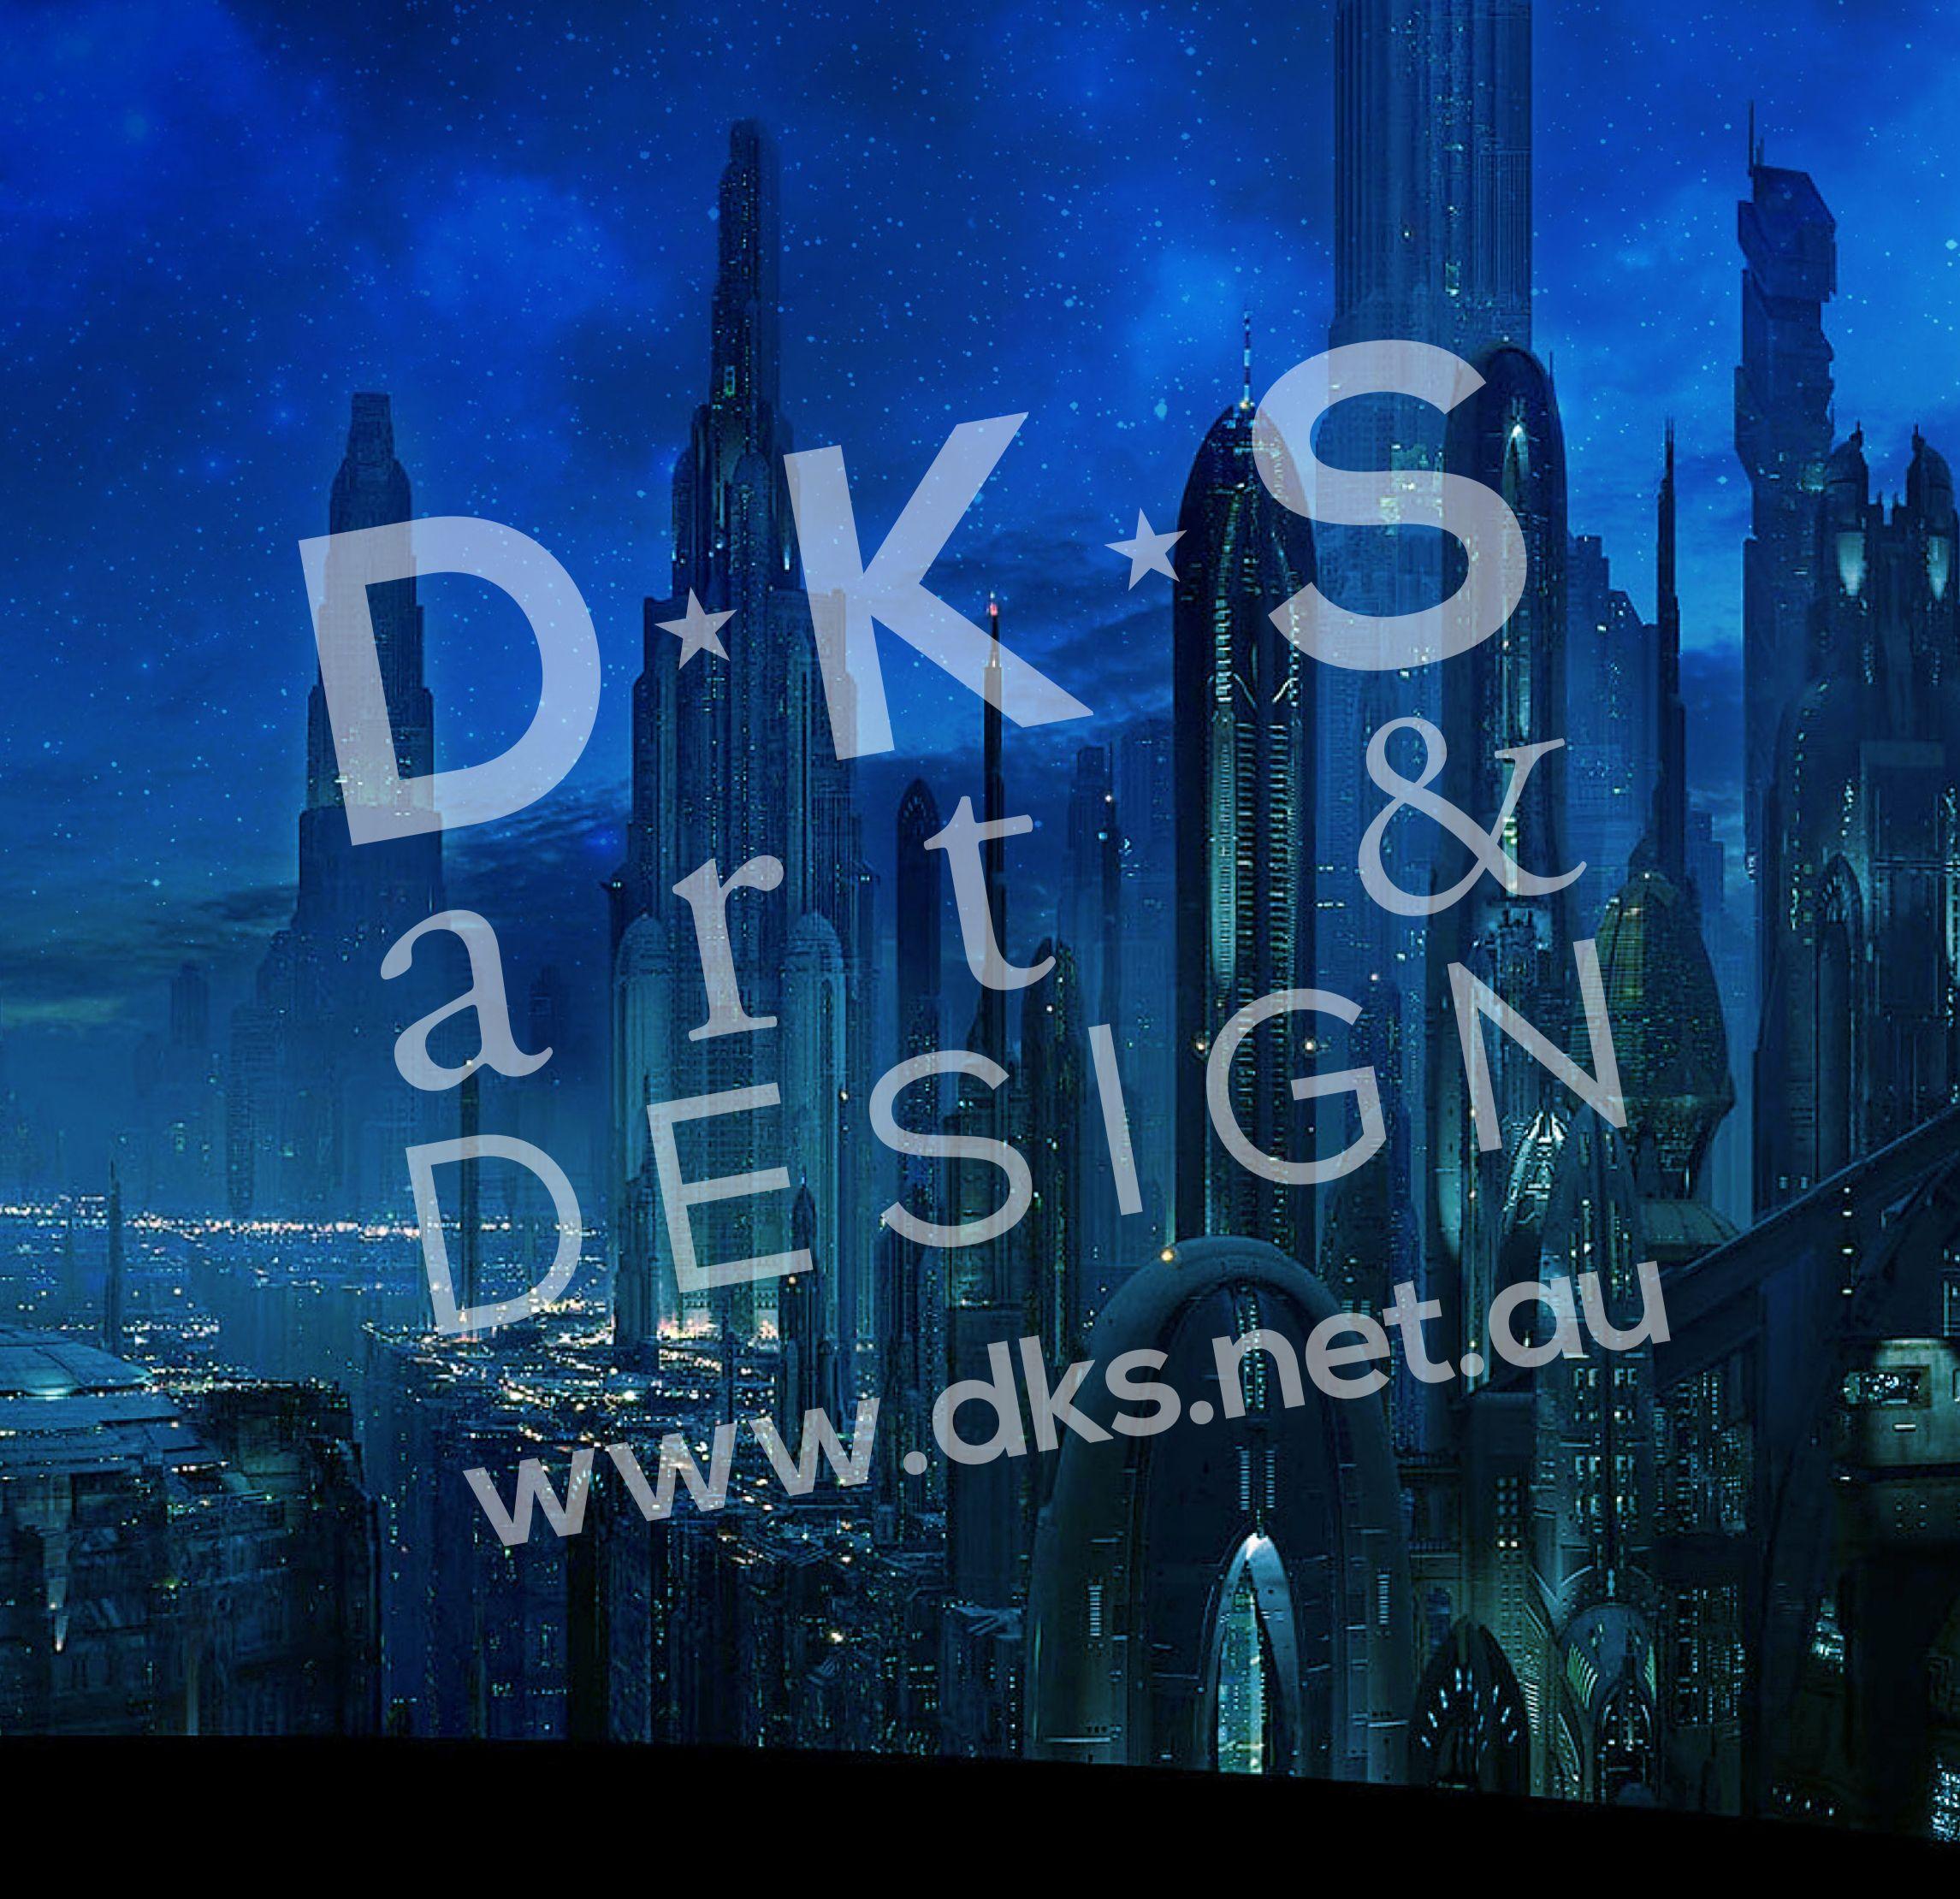 Star Wars Cabinet Star Wars Coruscant Display Background Design 2 Blue For Detolf